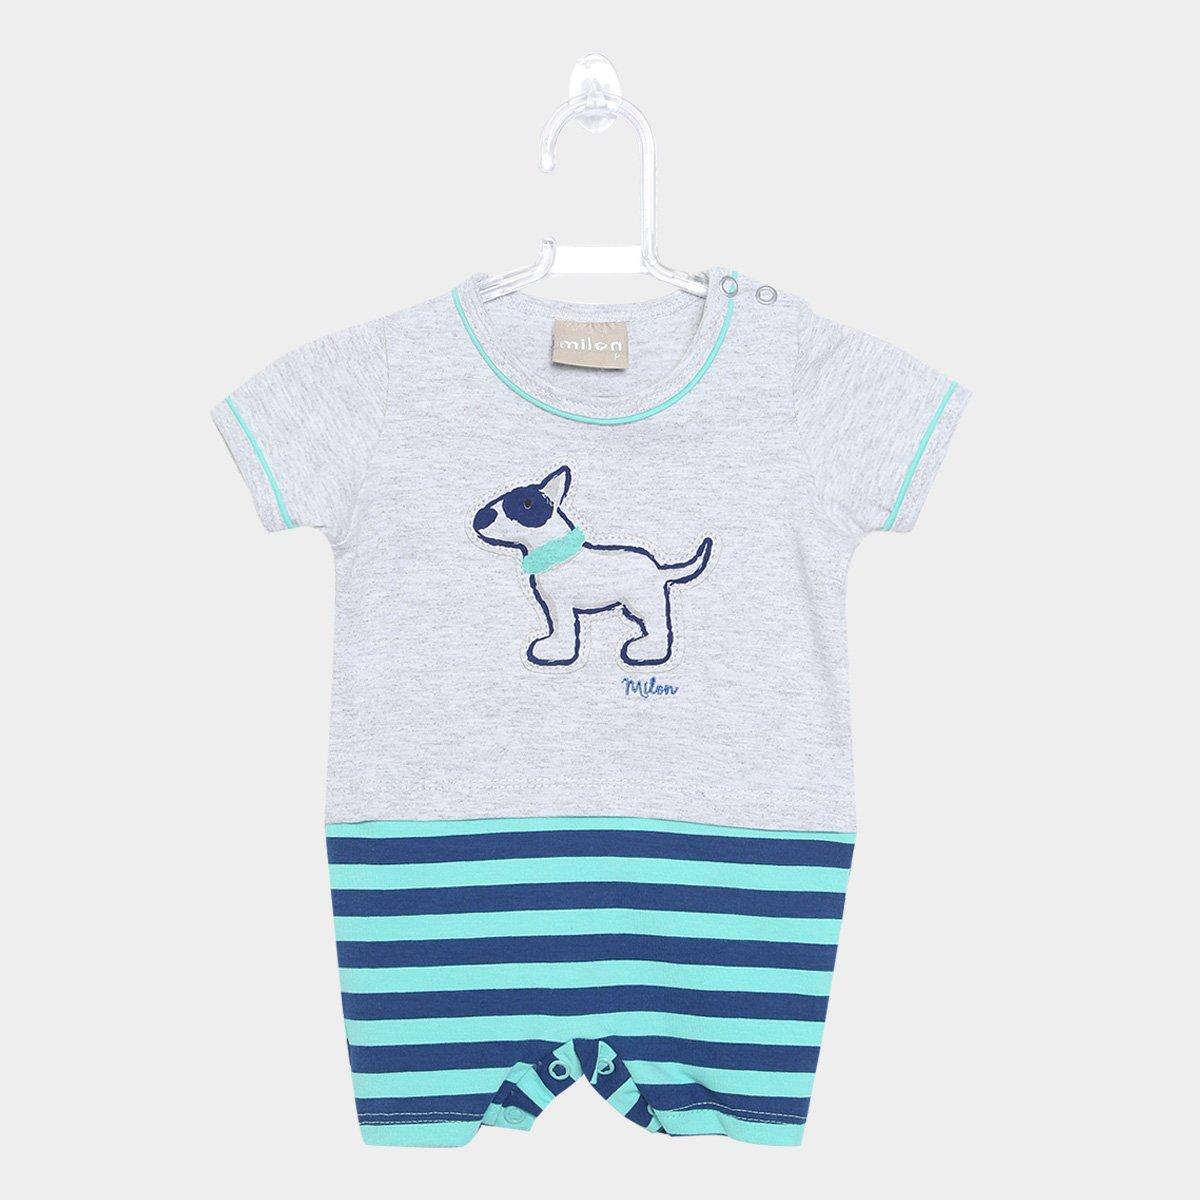 a75910b4b Body Bebê Milon Listrado Masculino - Compre Agora | Zattini